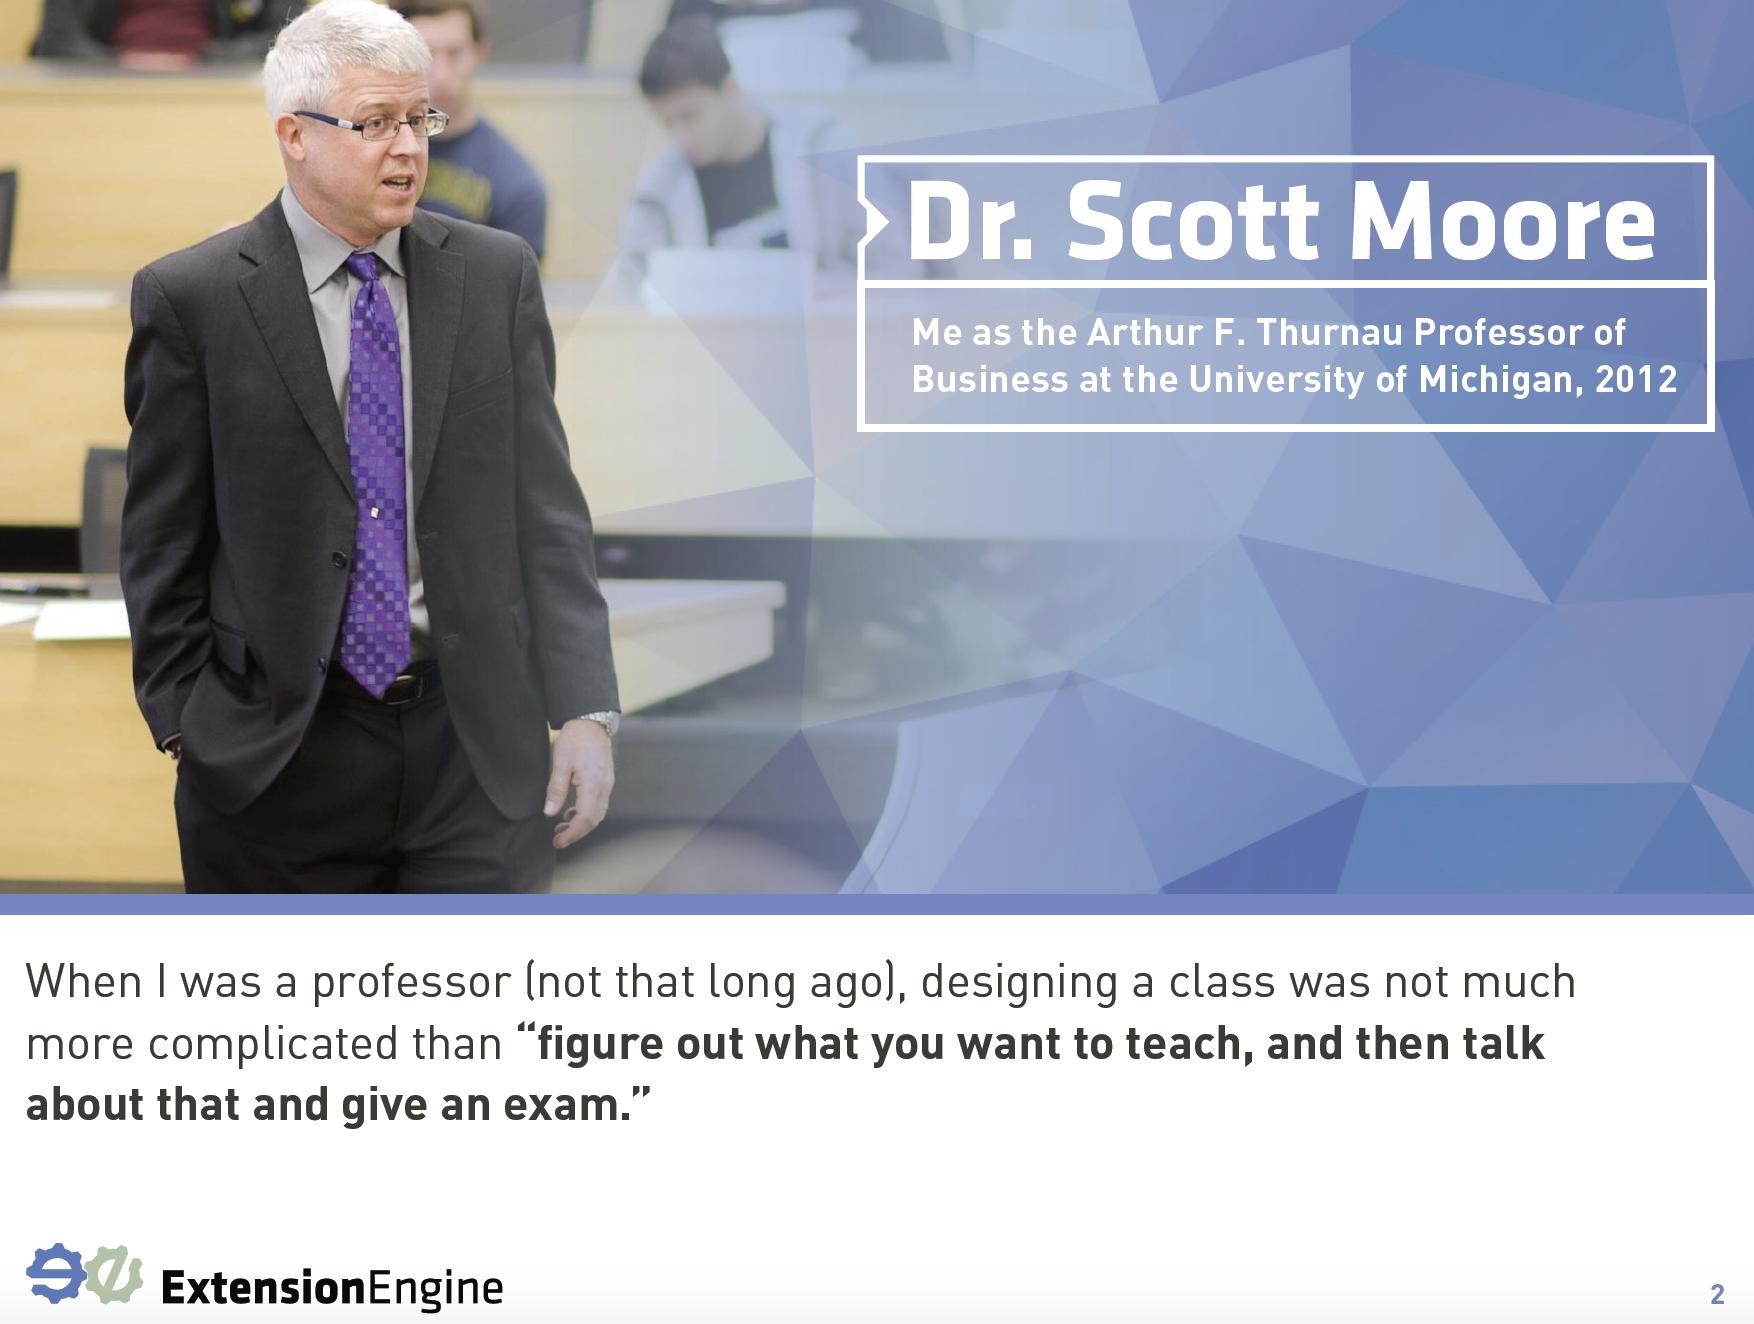 Dr Scott Moore Online Program Management University of Michigan Custom Leanring Experiences